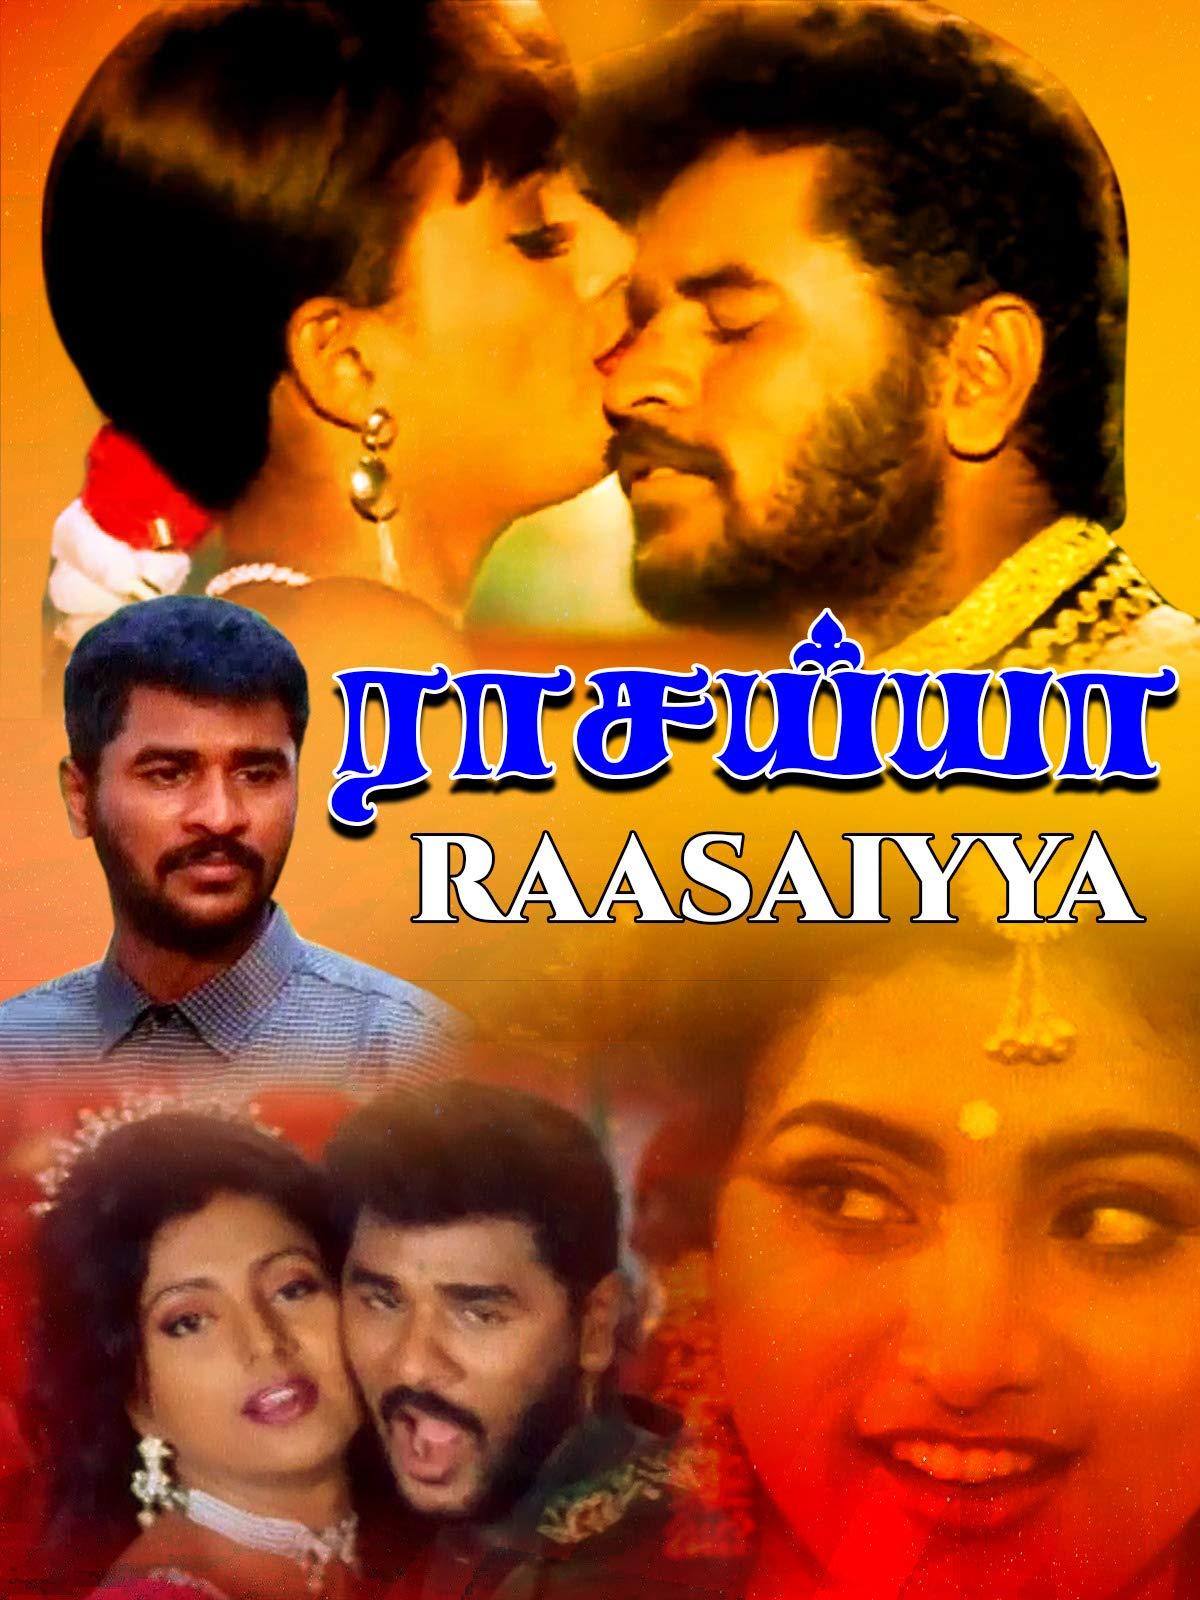 Amazon.com: Raasaiyya: Prabhu Deva, Roja, Vijayakumar, Vadivelu